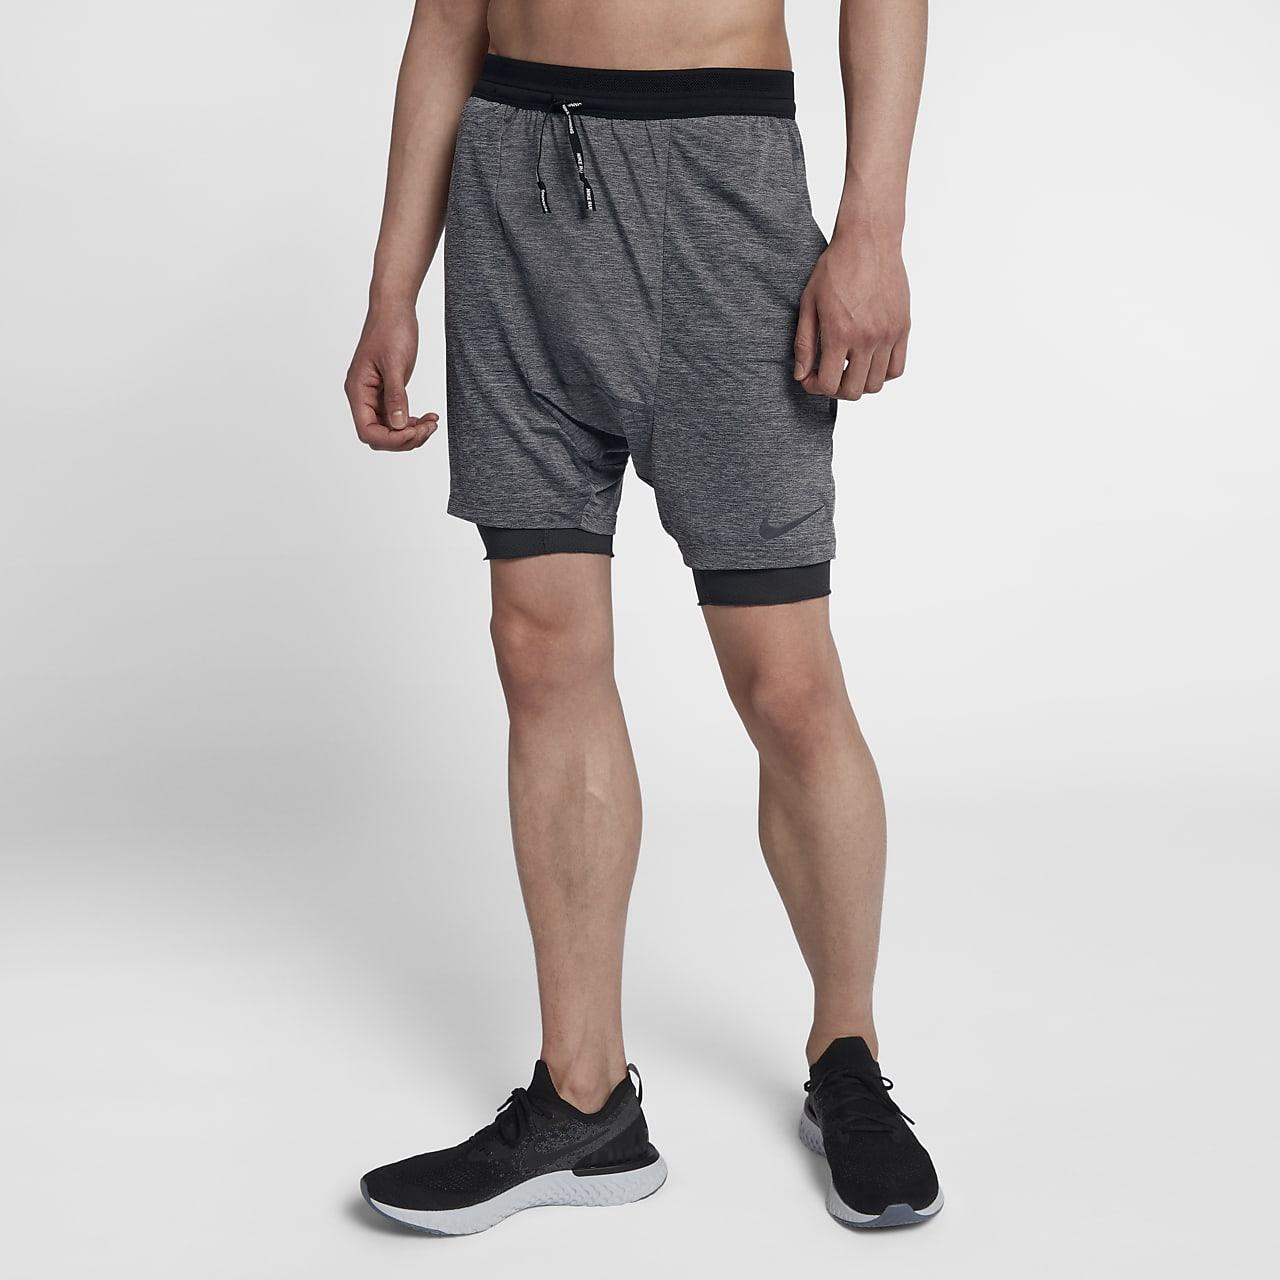 "Nike Run Division Flex Stride 2-in-1 Men's 7"" (18cm approx.) Running Shorts"